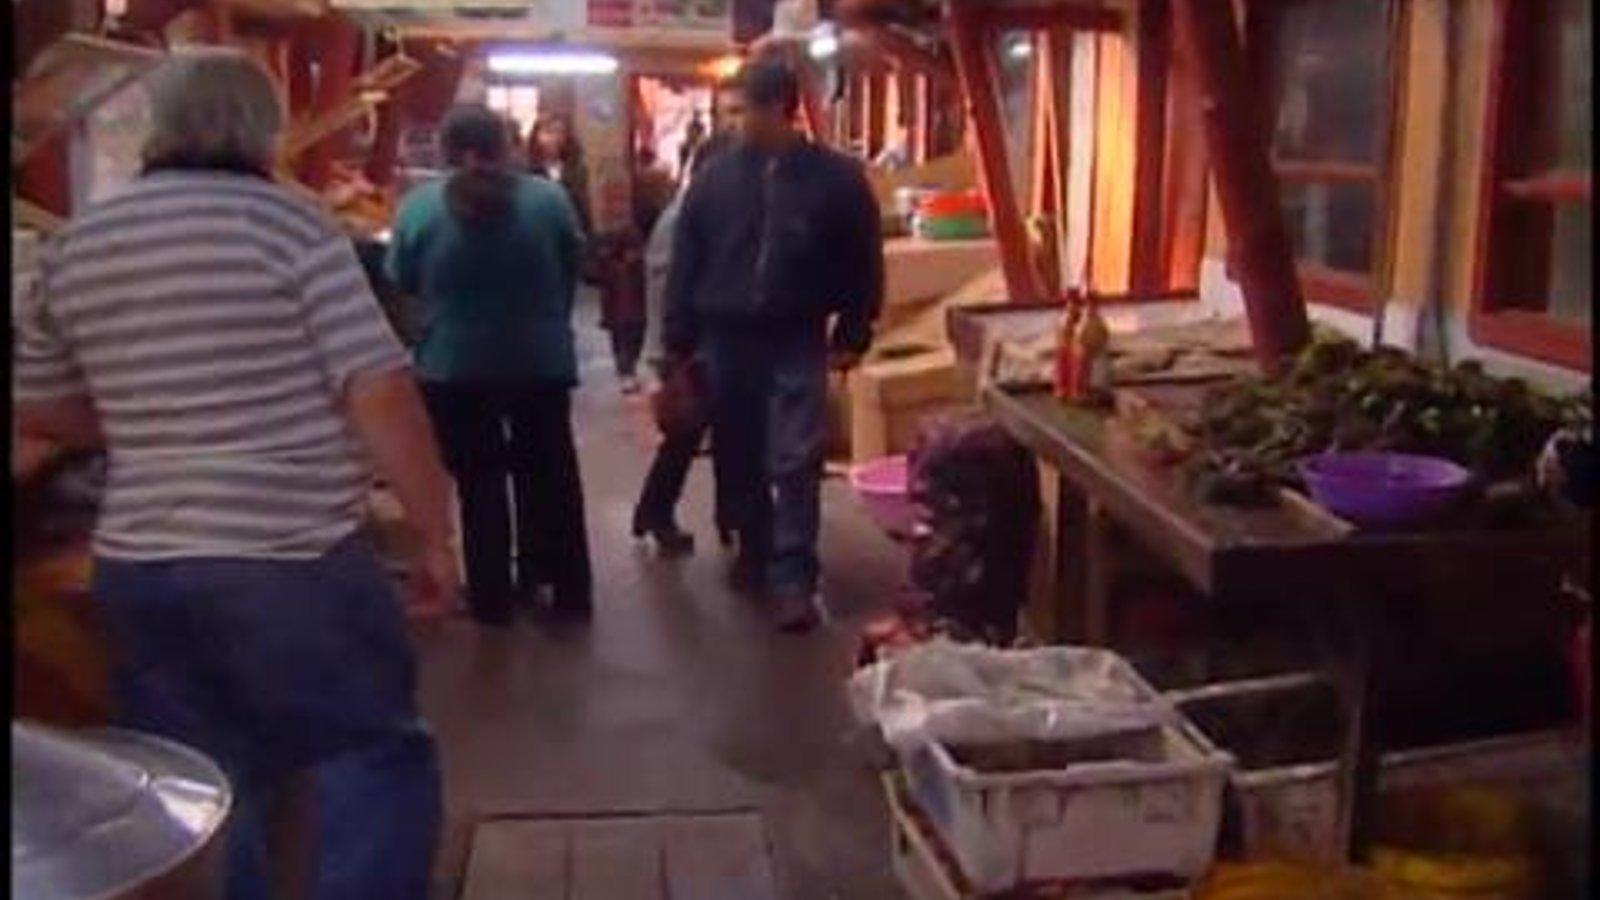 Chile 2 - Punta Arenas, Puerto Montt, and Valparaiso